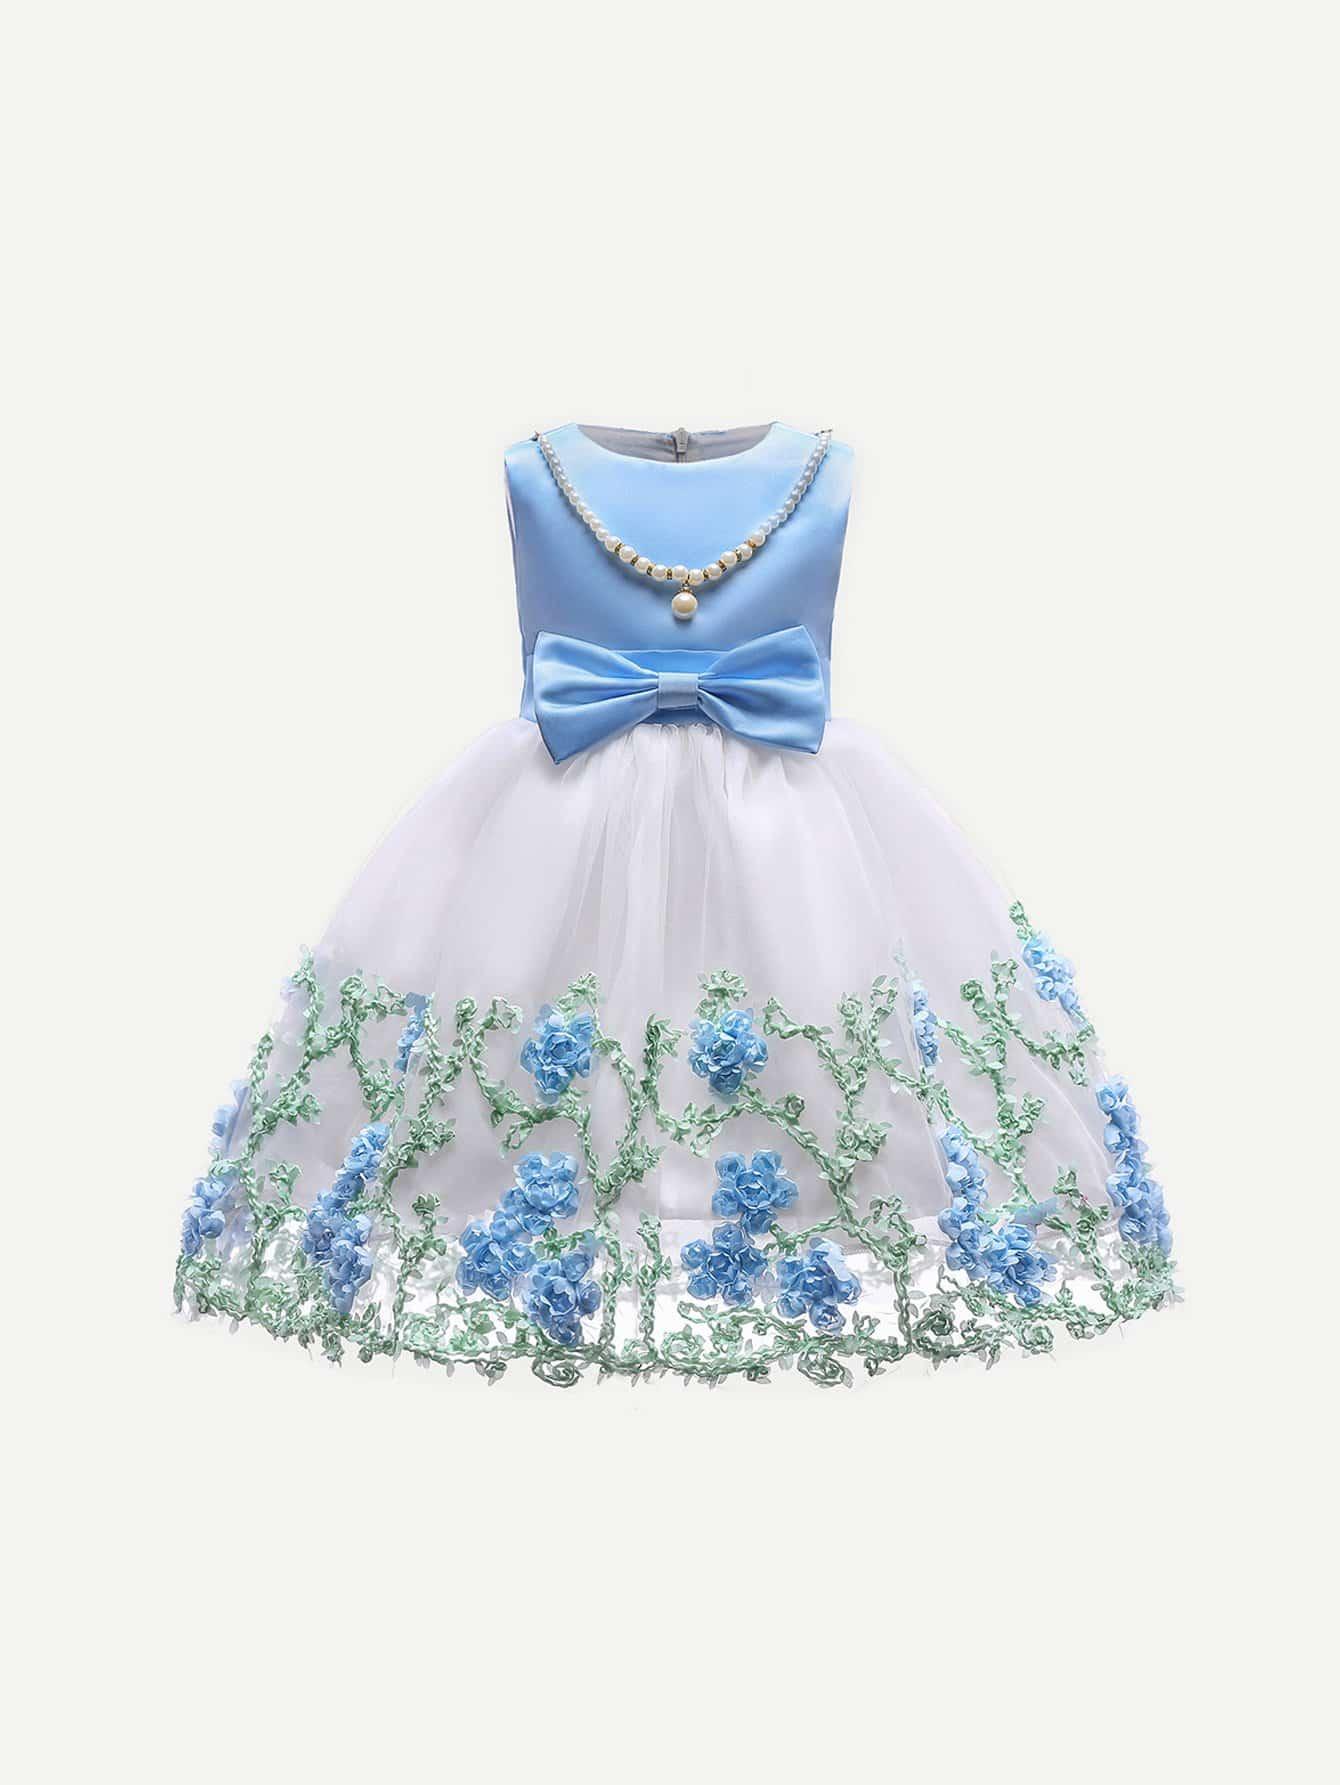 Girls Candy Pattern Mesh Overlay Ball Gown -SheIn(Sheinside)